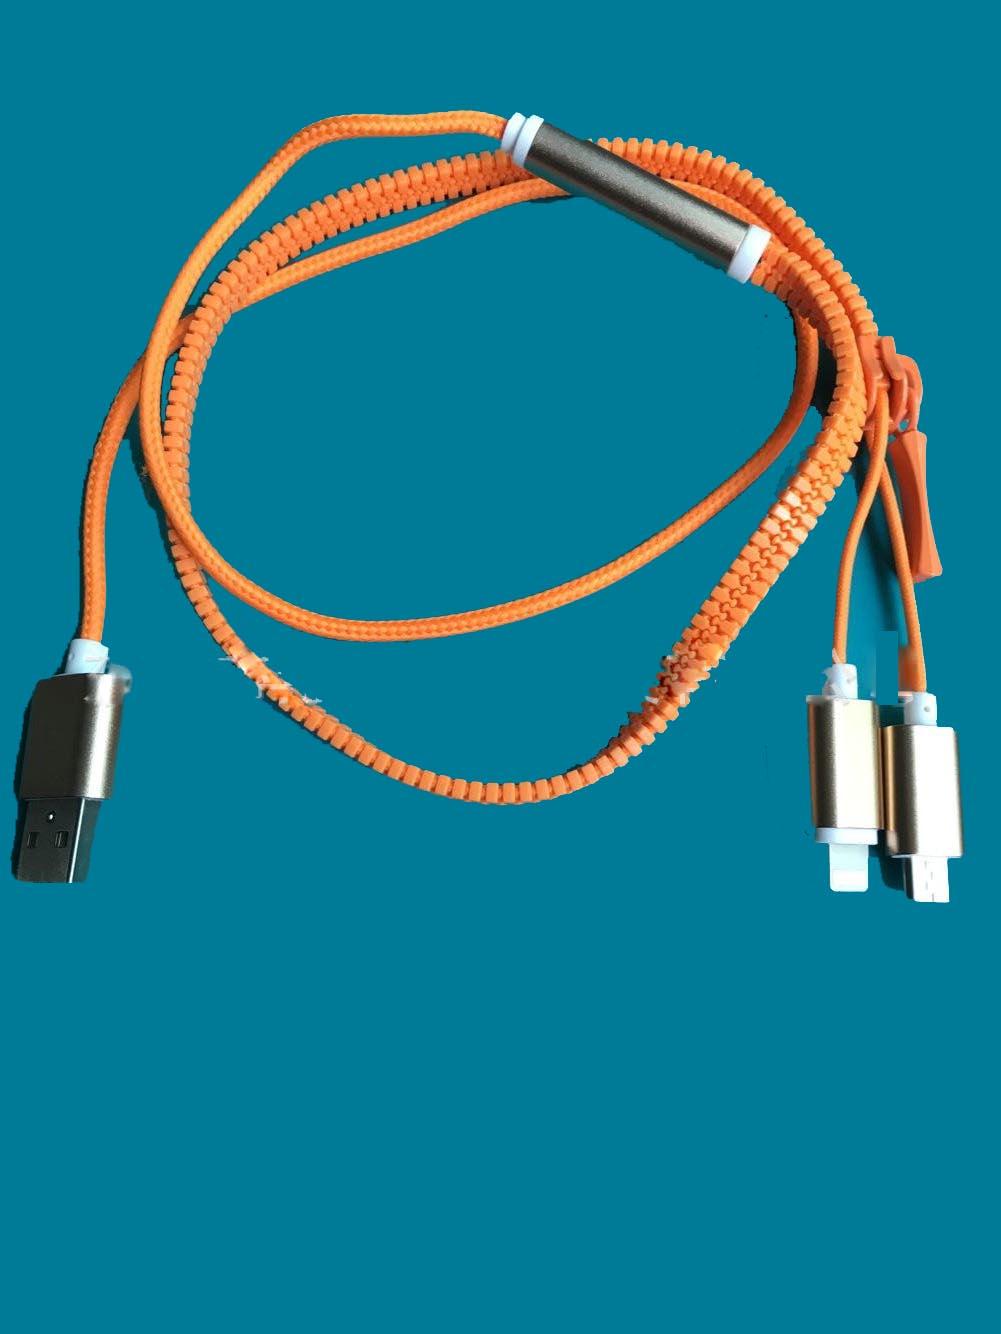 DC充电线厂家批发-销量好的DC充电线生产厂家